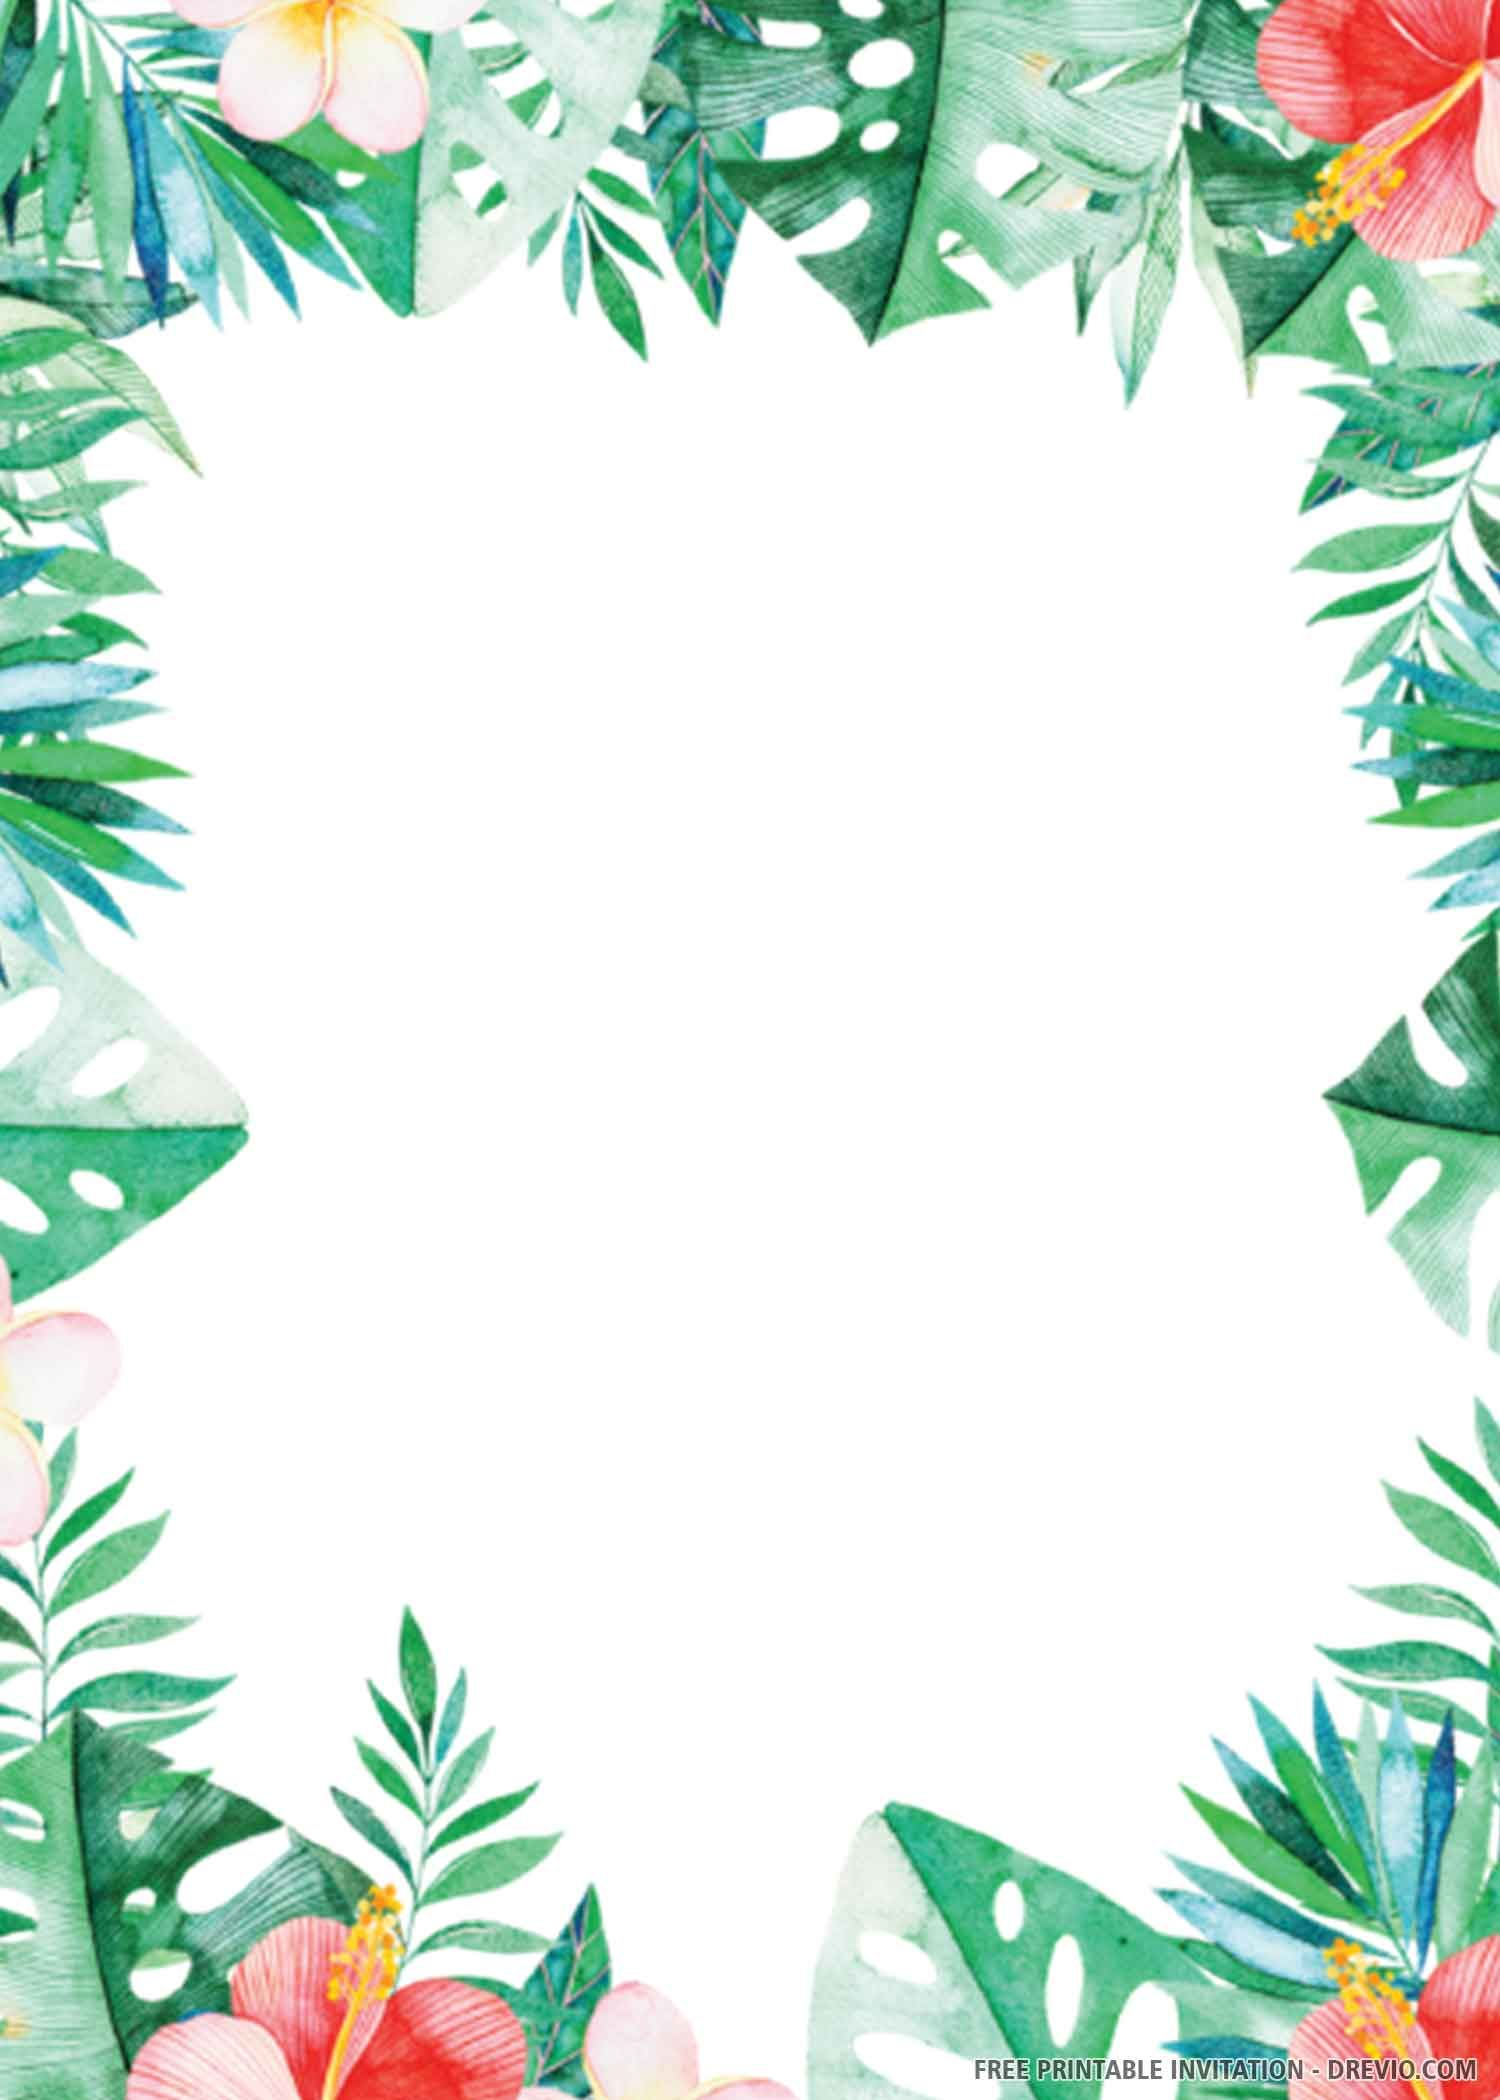 Free printable tropical wedding invitation